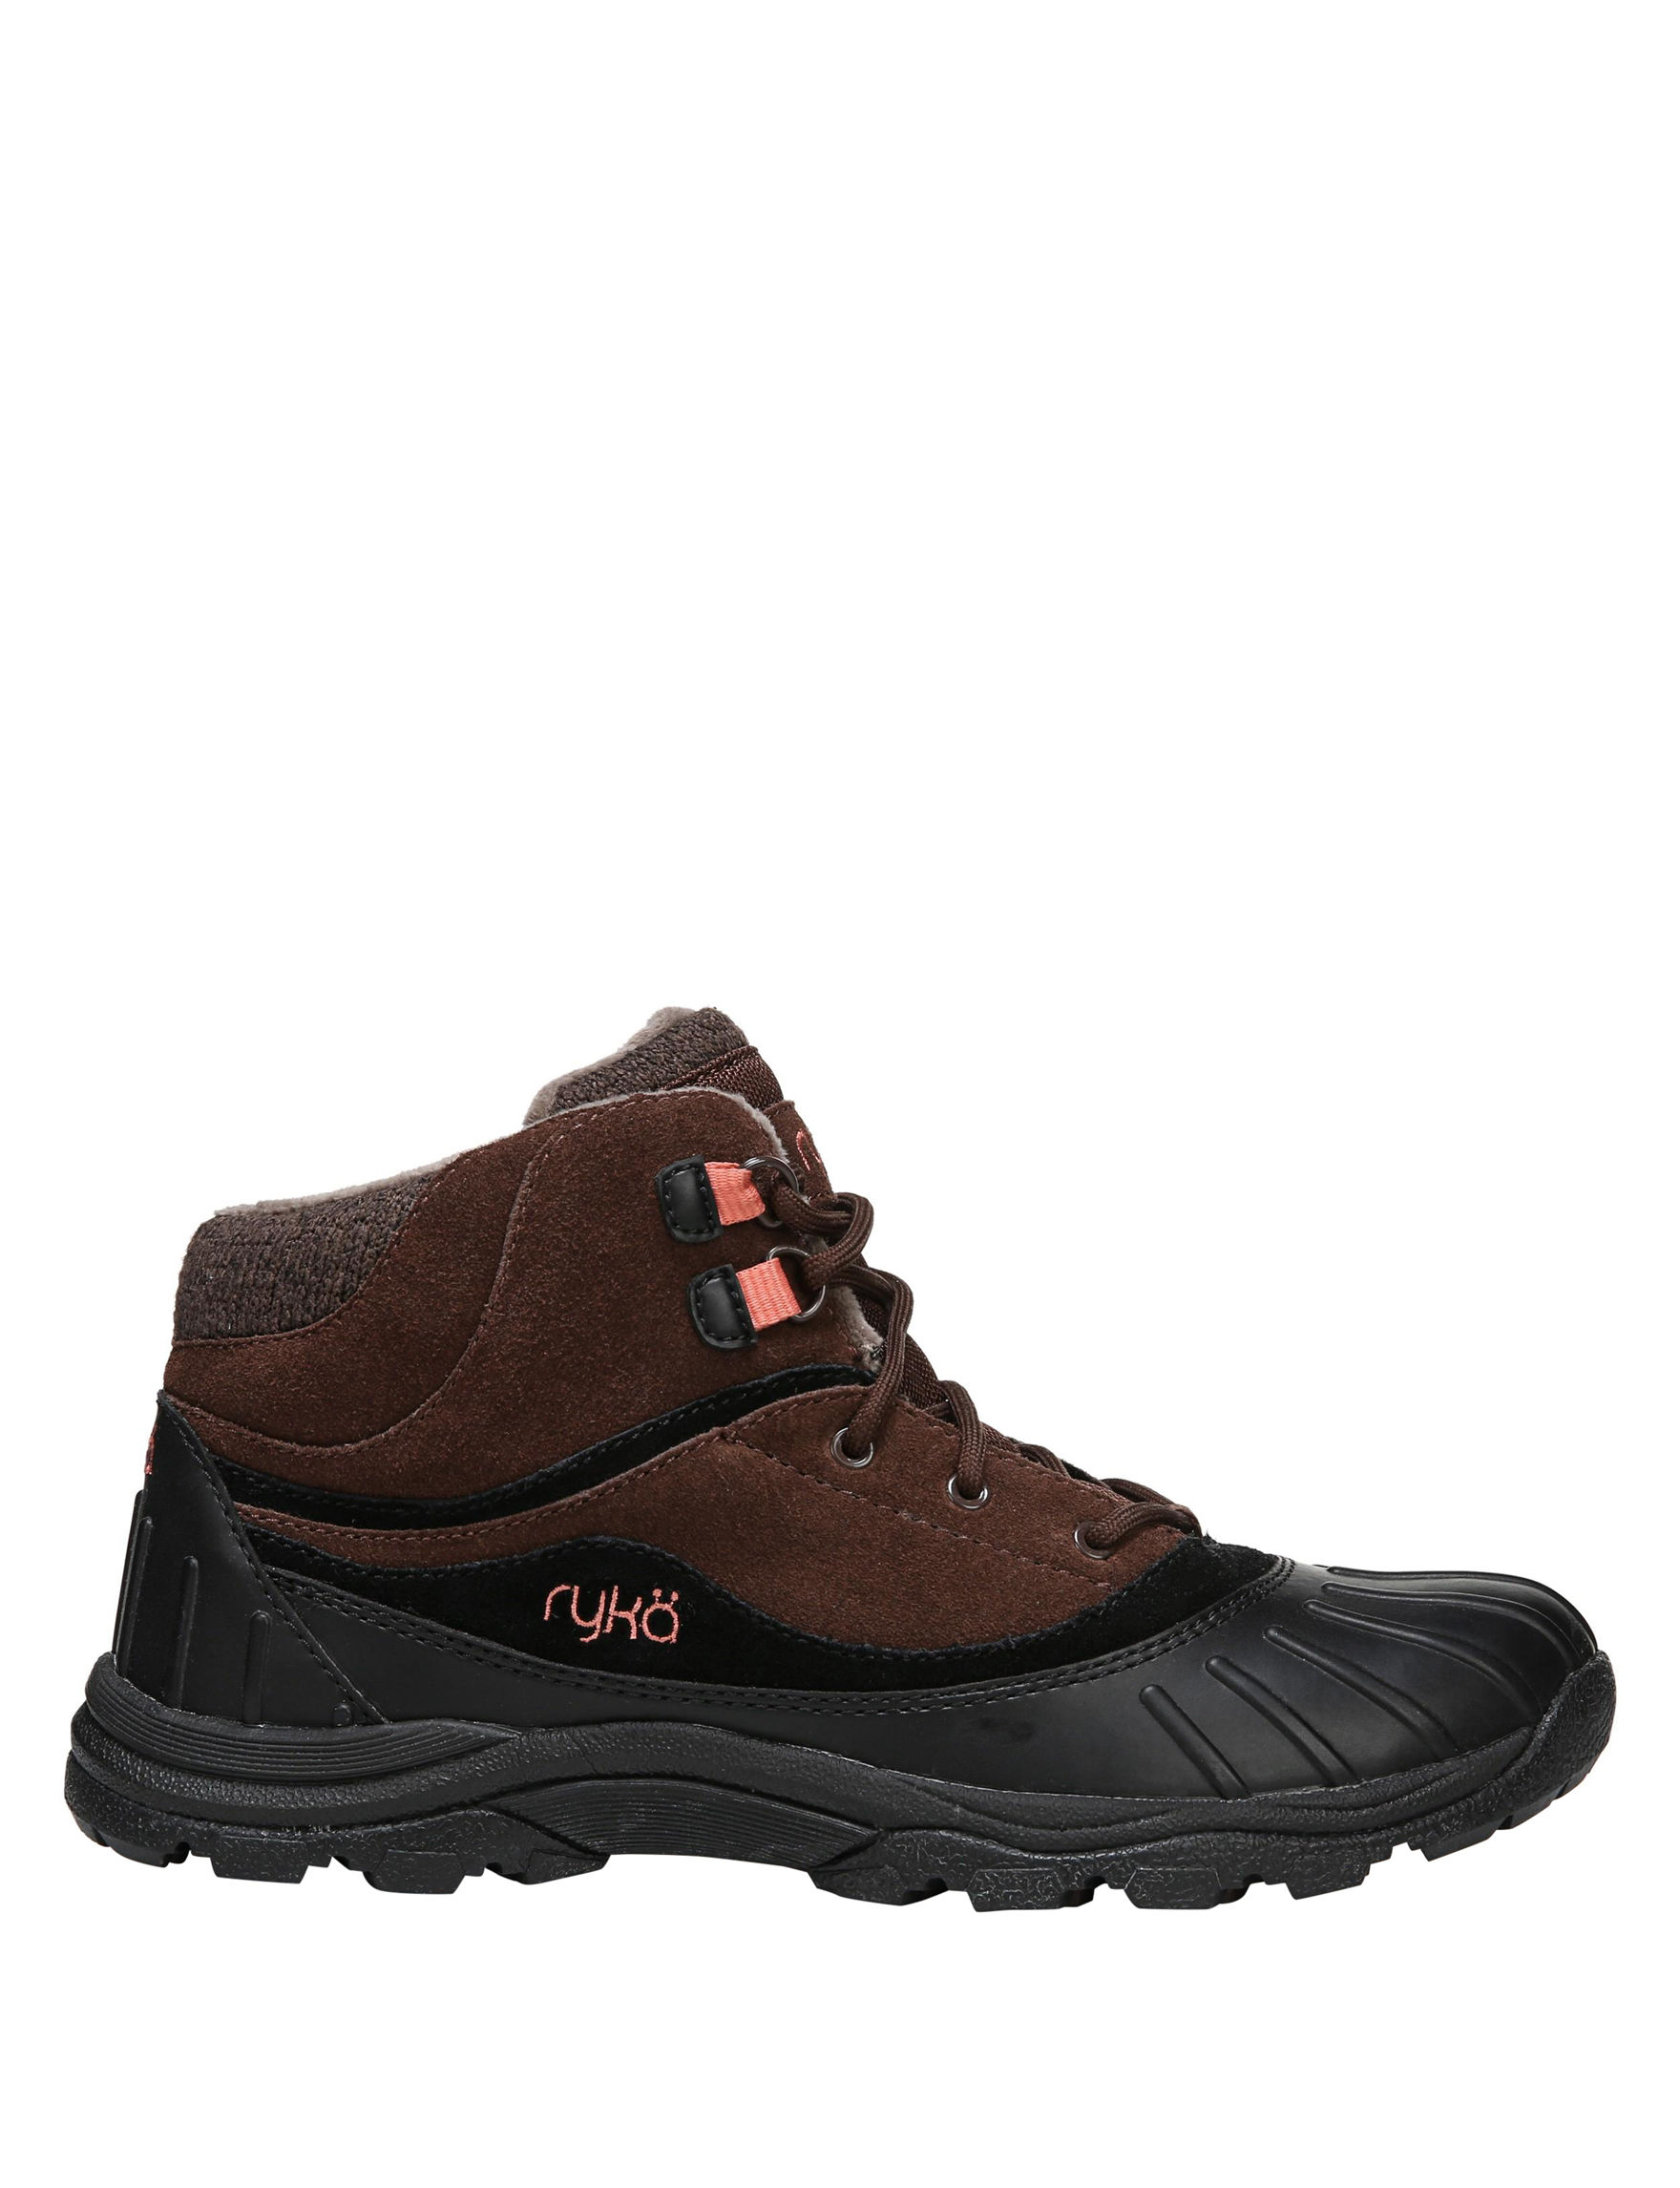 Ryka Brown Multi Hiking Boots Comfort